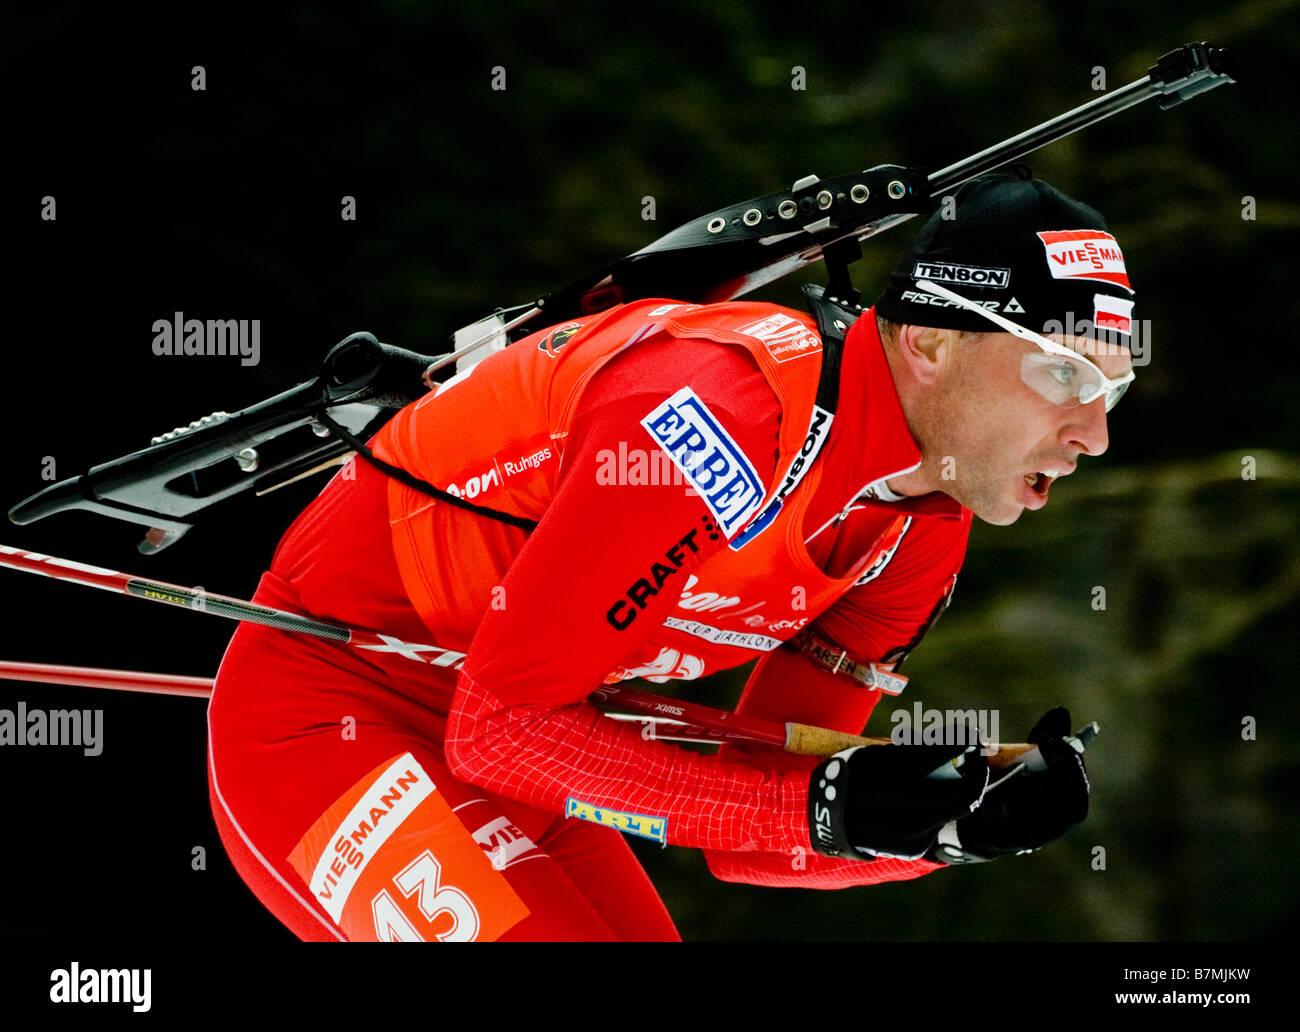 SIKORA Tomasz Polen Biathlon Weltcup Verfolgung Frauen Männer Ruhpolding 18 1 2009 - Stock Image